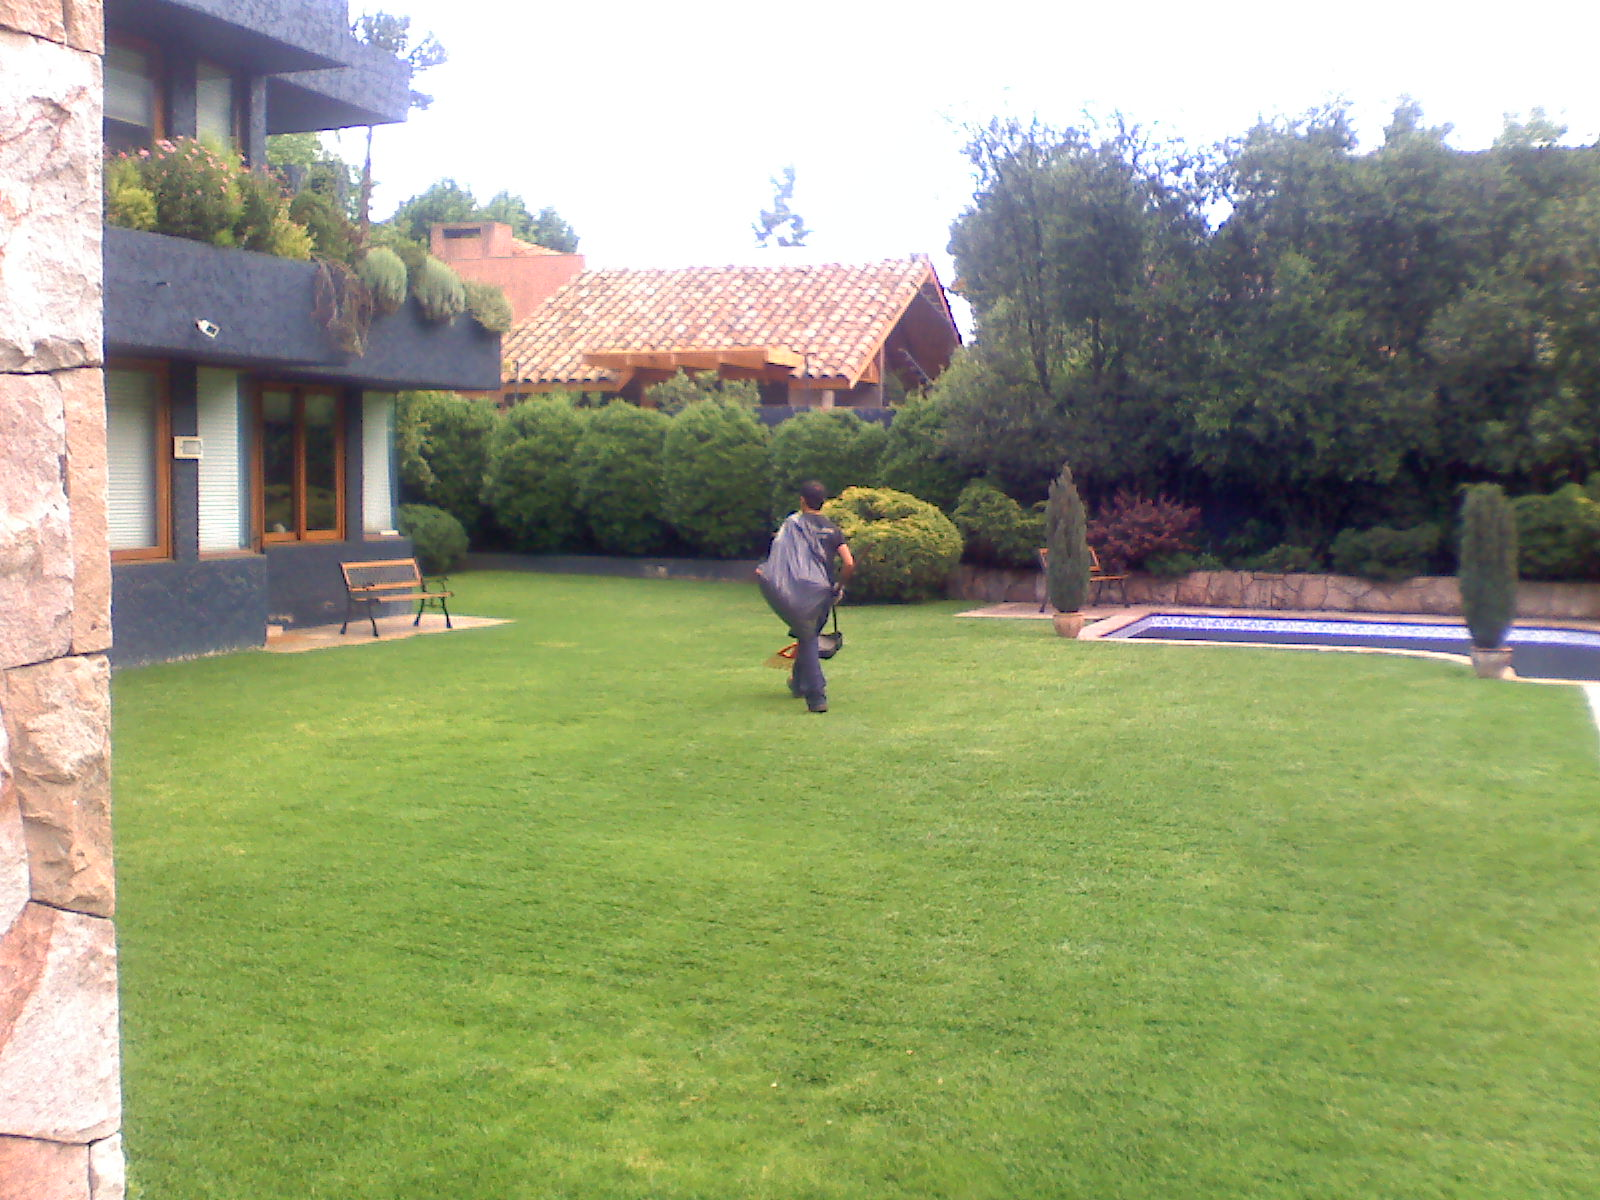 Darrigrandi y simunovic jardineria semillas o cesped - Cuando plantar cesped ...